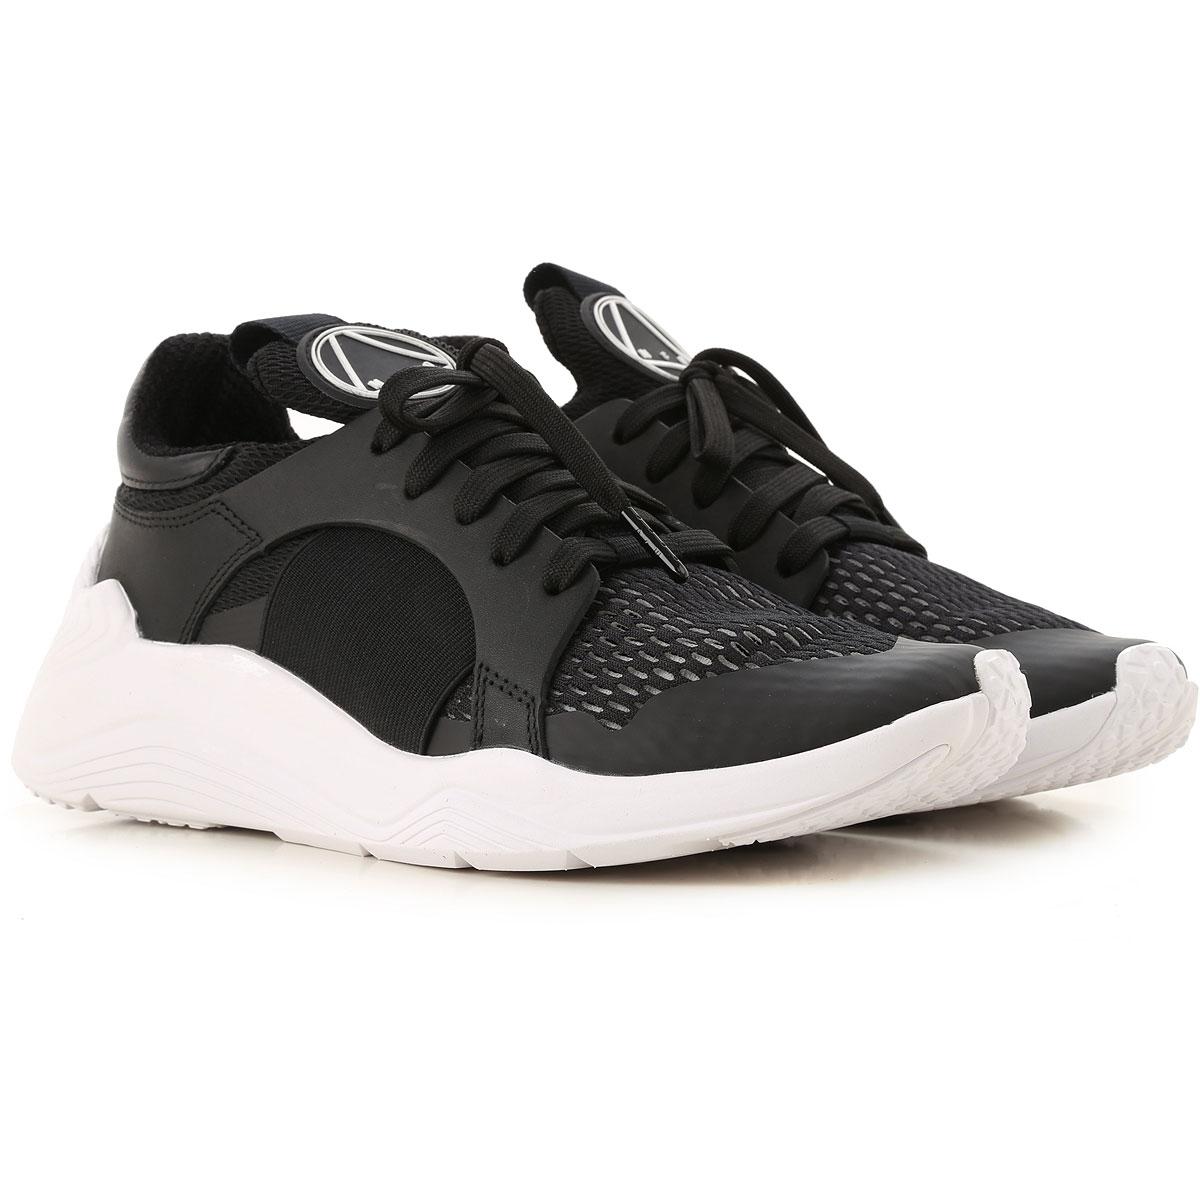 Alexander McQueen Sneakers for Women On Sale, Black, Textile, 2017, 2.5 3.5